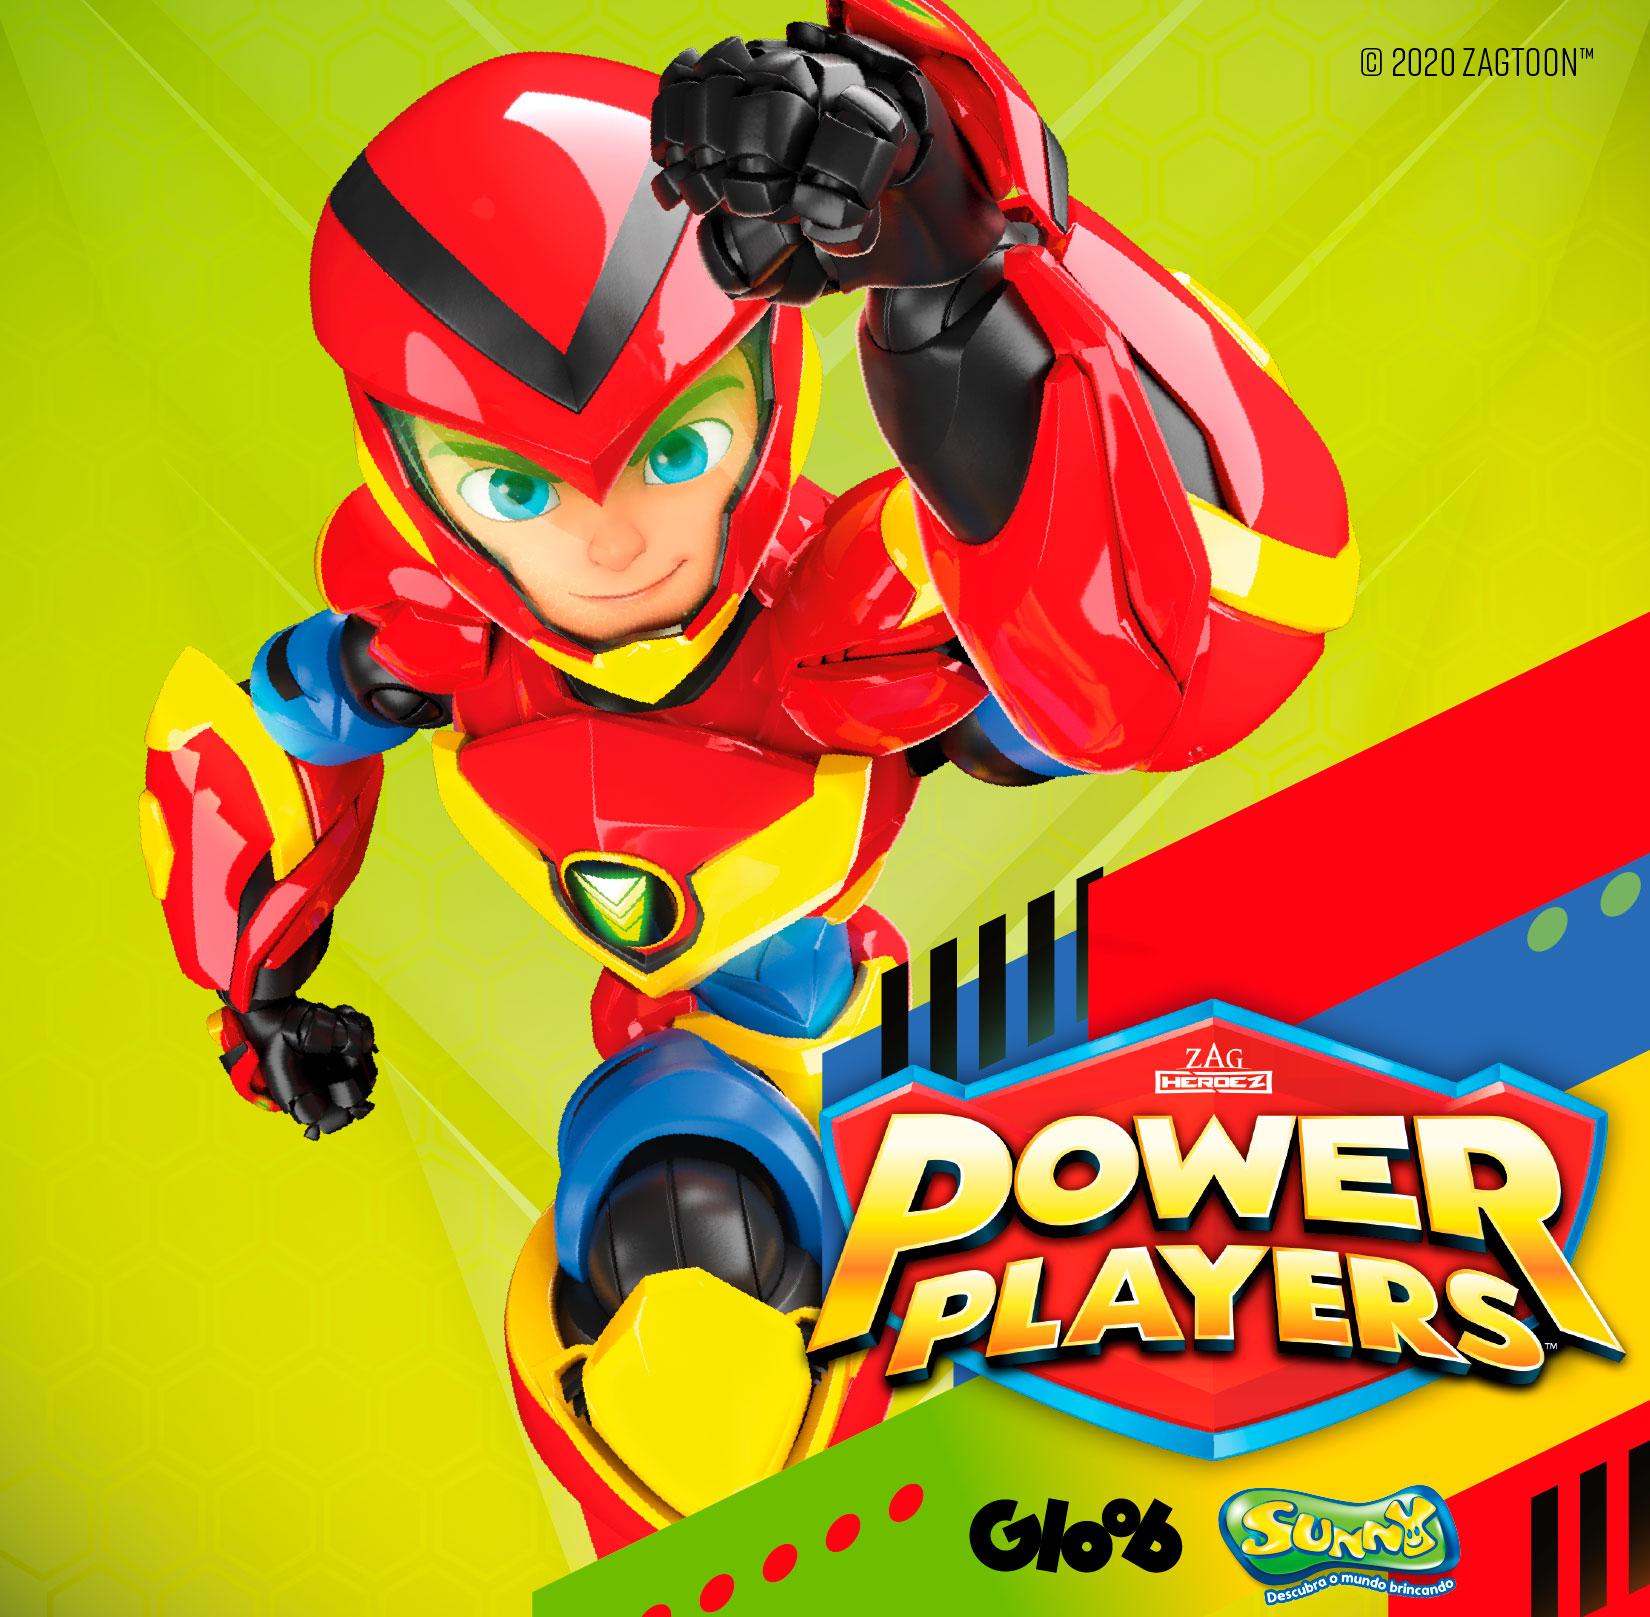 Power Player